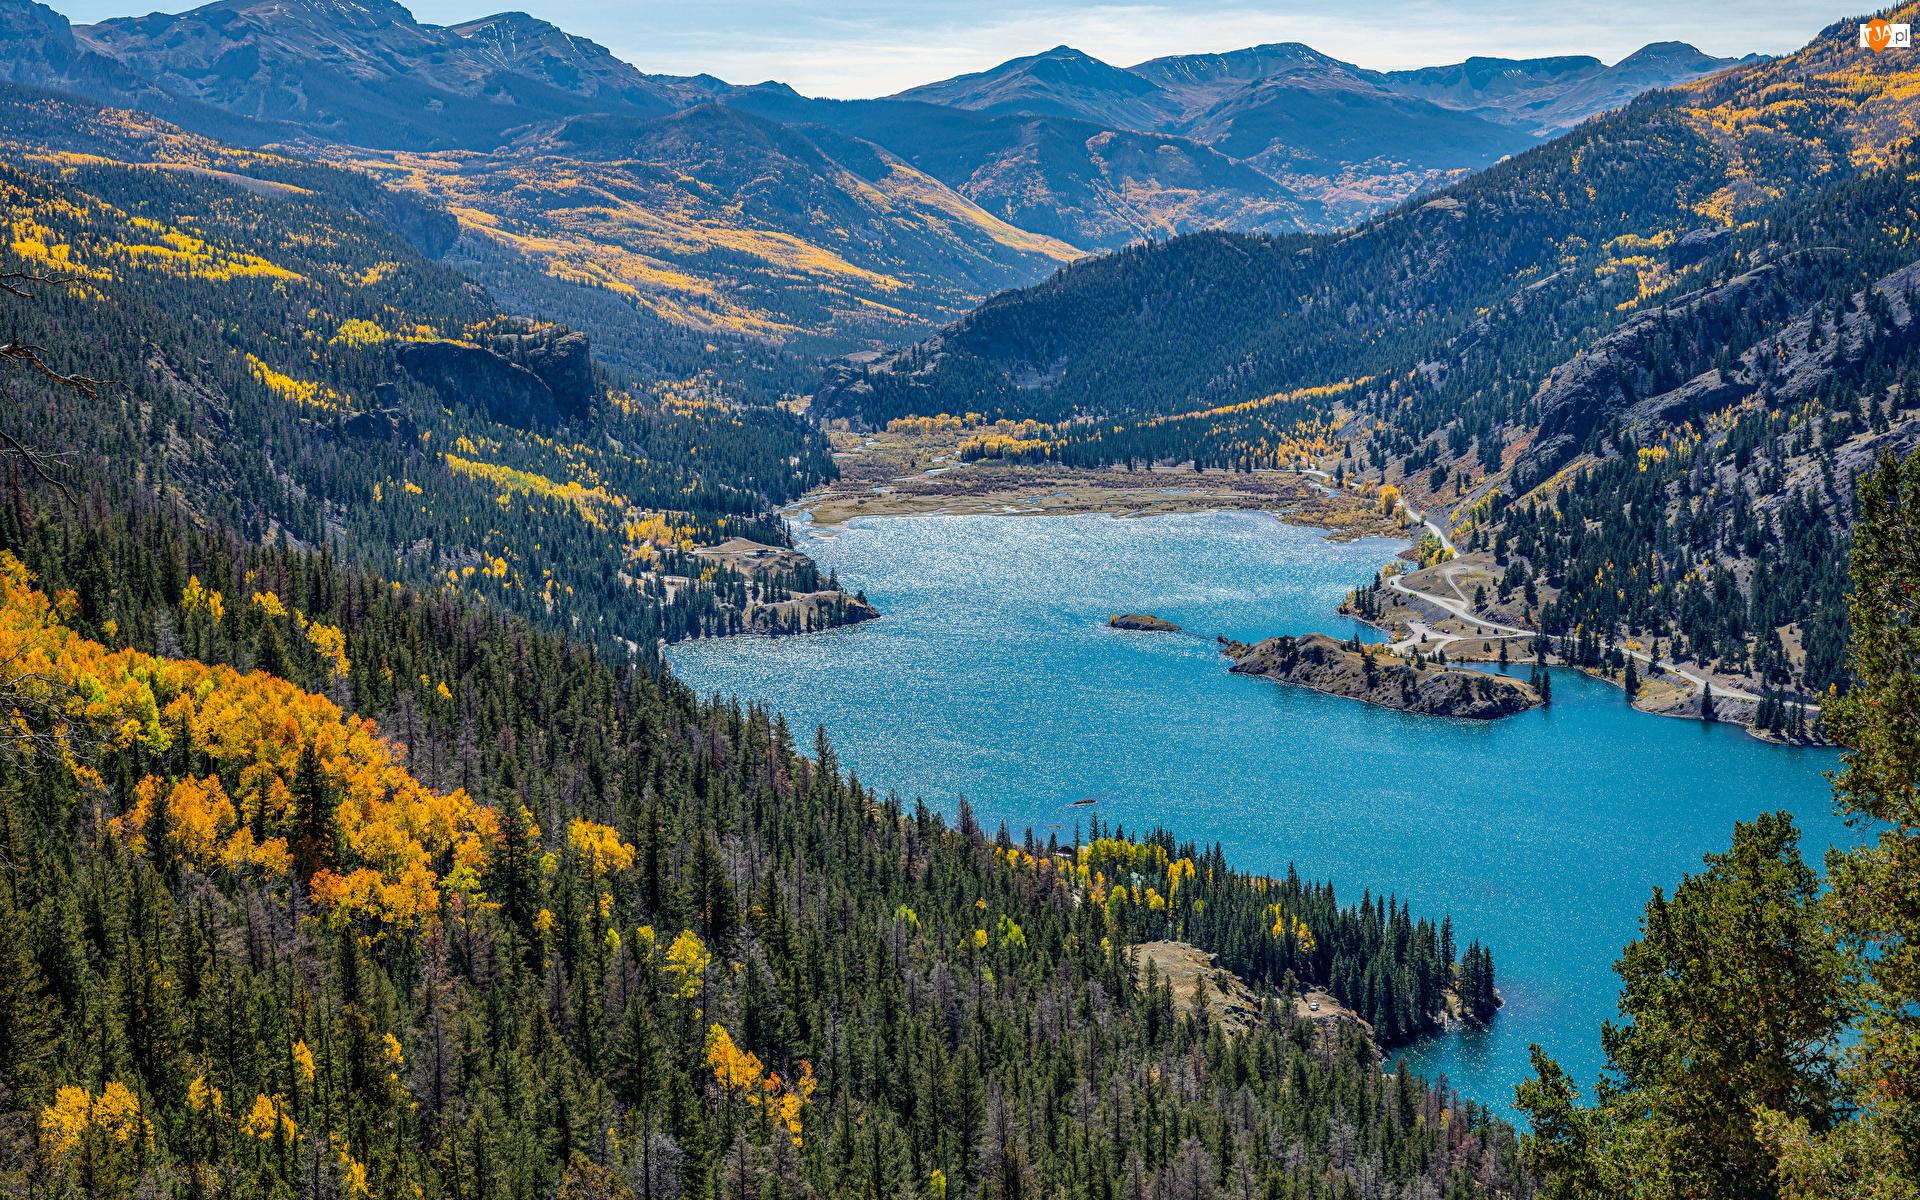 San Cristobal Lake, Góry, Stany Zjednoczone, Jezioro, Kolorado, Lasy, San Juan Mountains